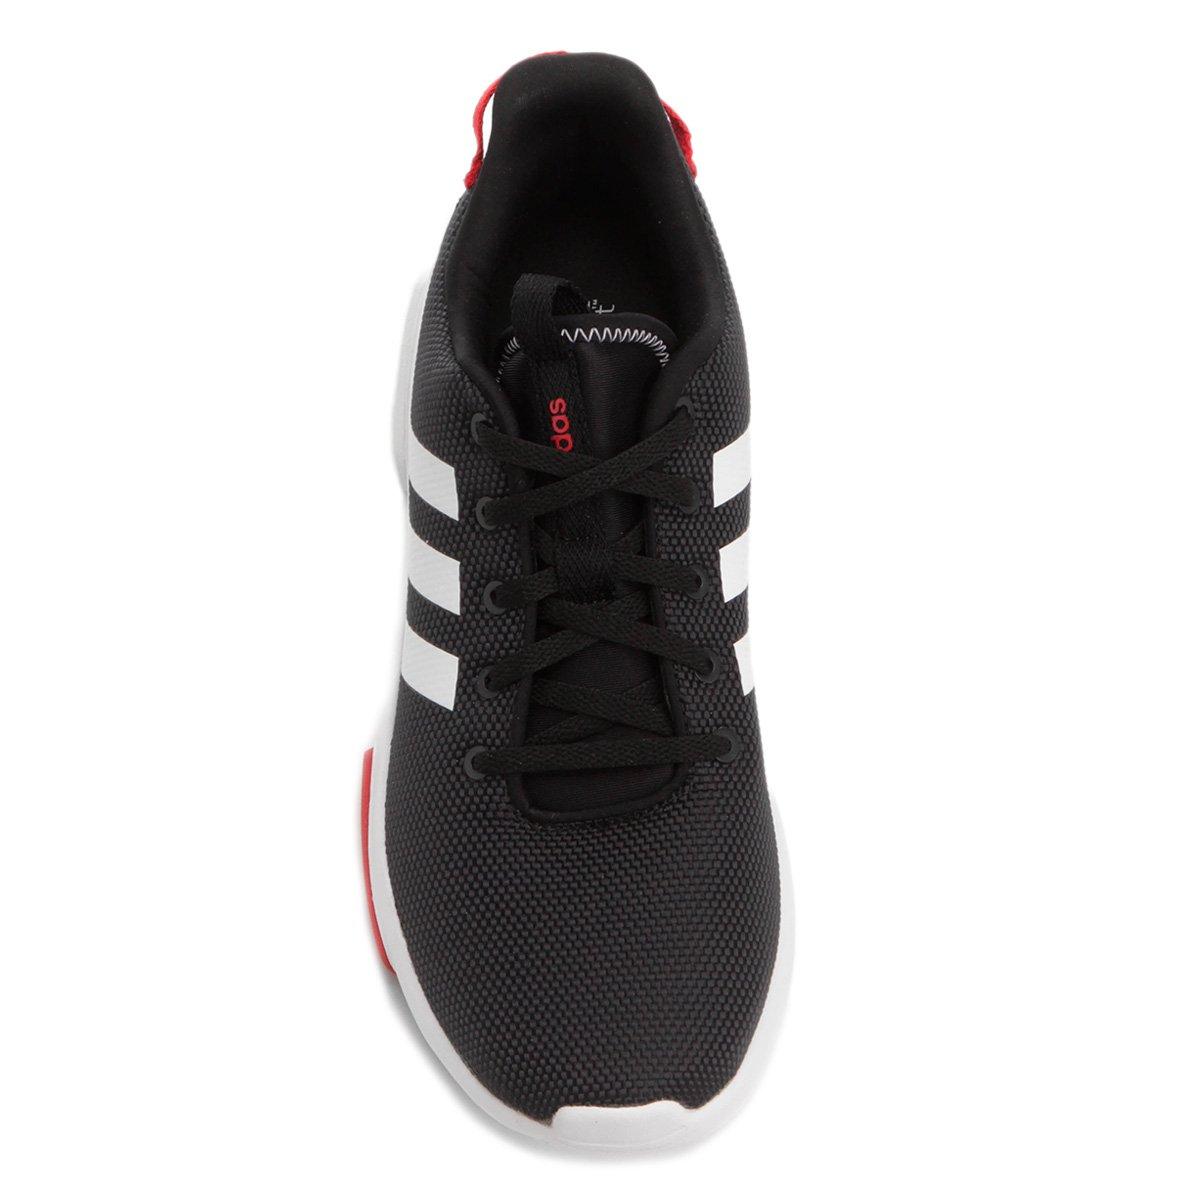 Tênis Adidas Cf Racer Tr Masculino - Preto - Compre Agora  6d6cde0747158